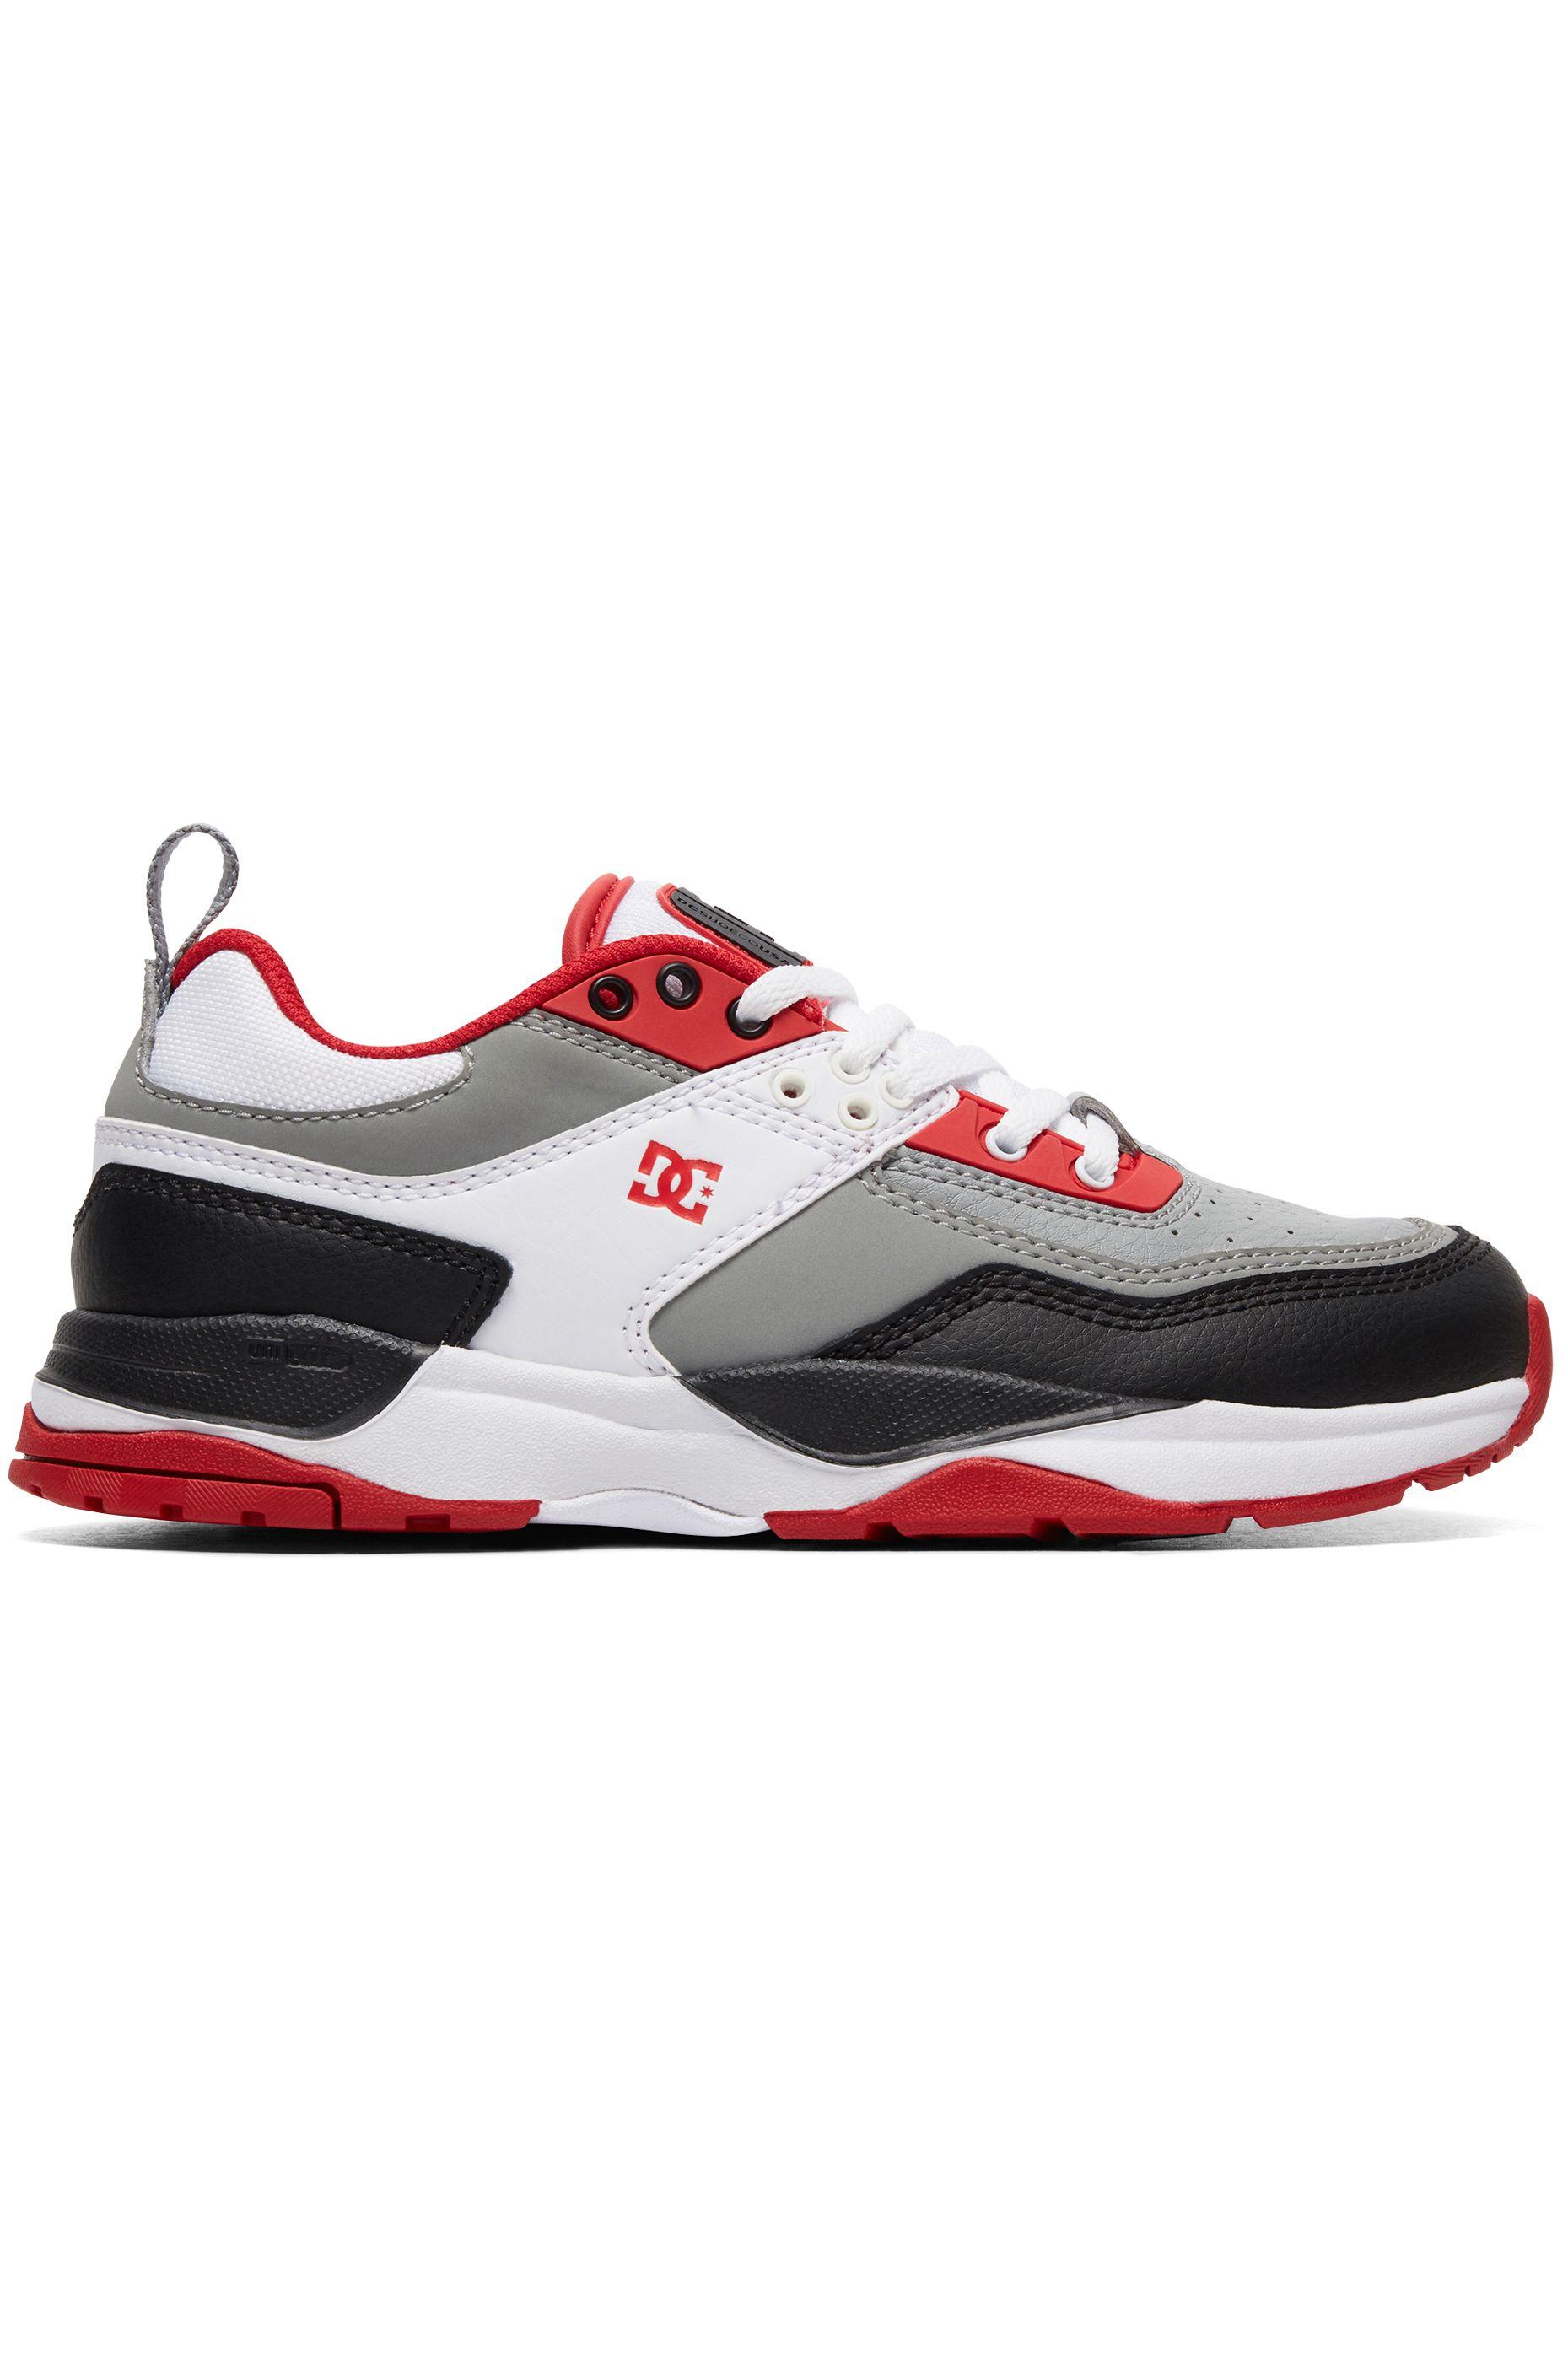 DC Shoes Shoes E.TRIBEKA White/Grey/Red